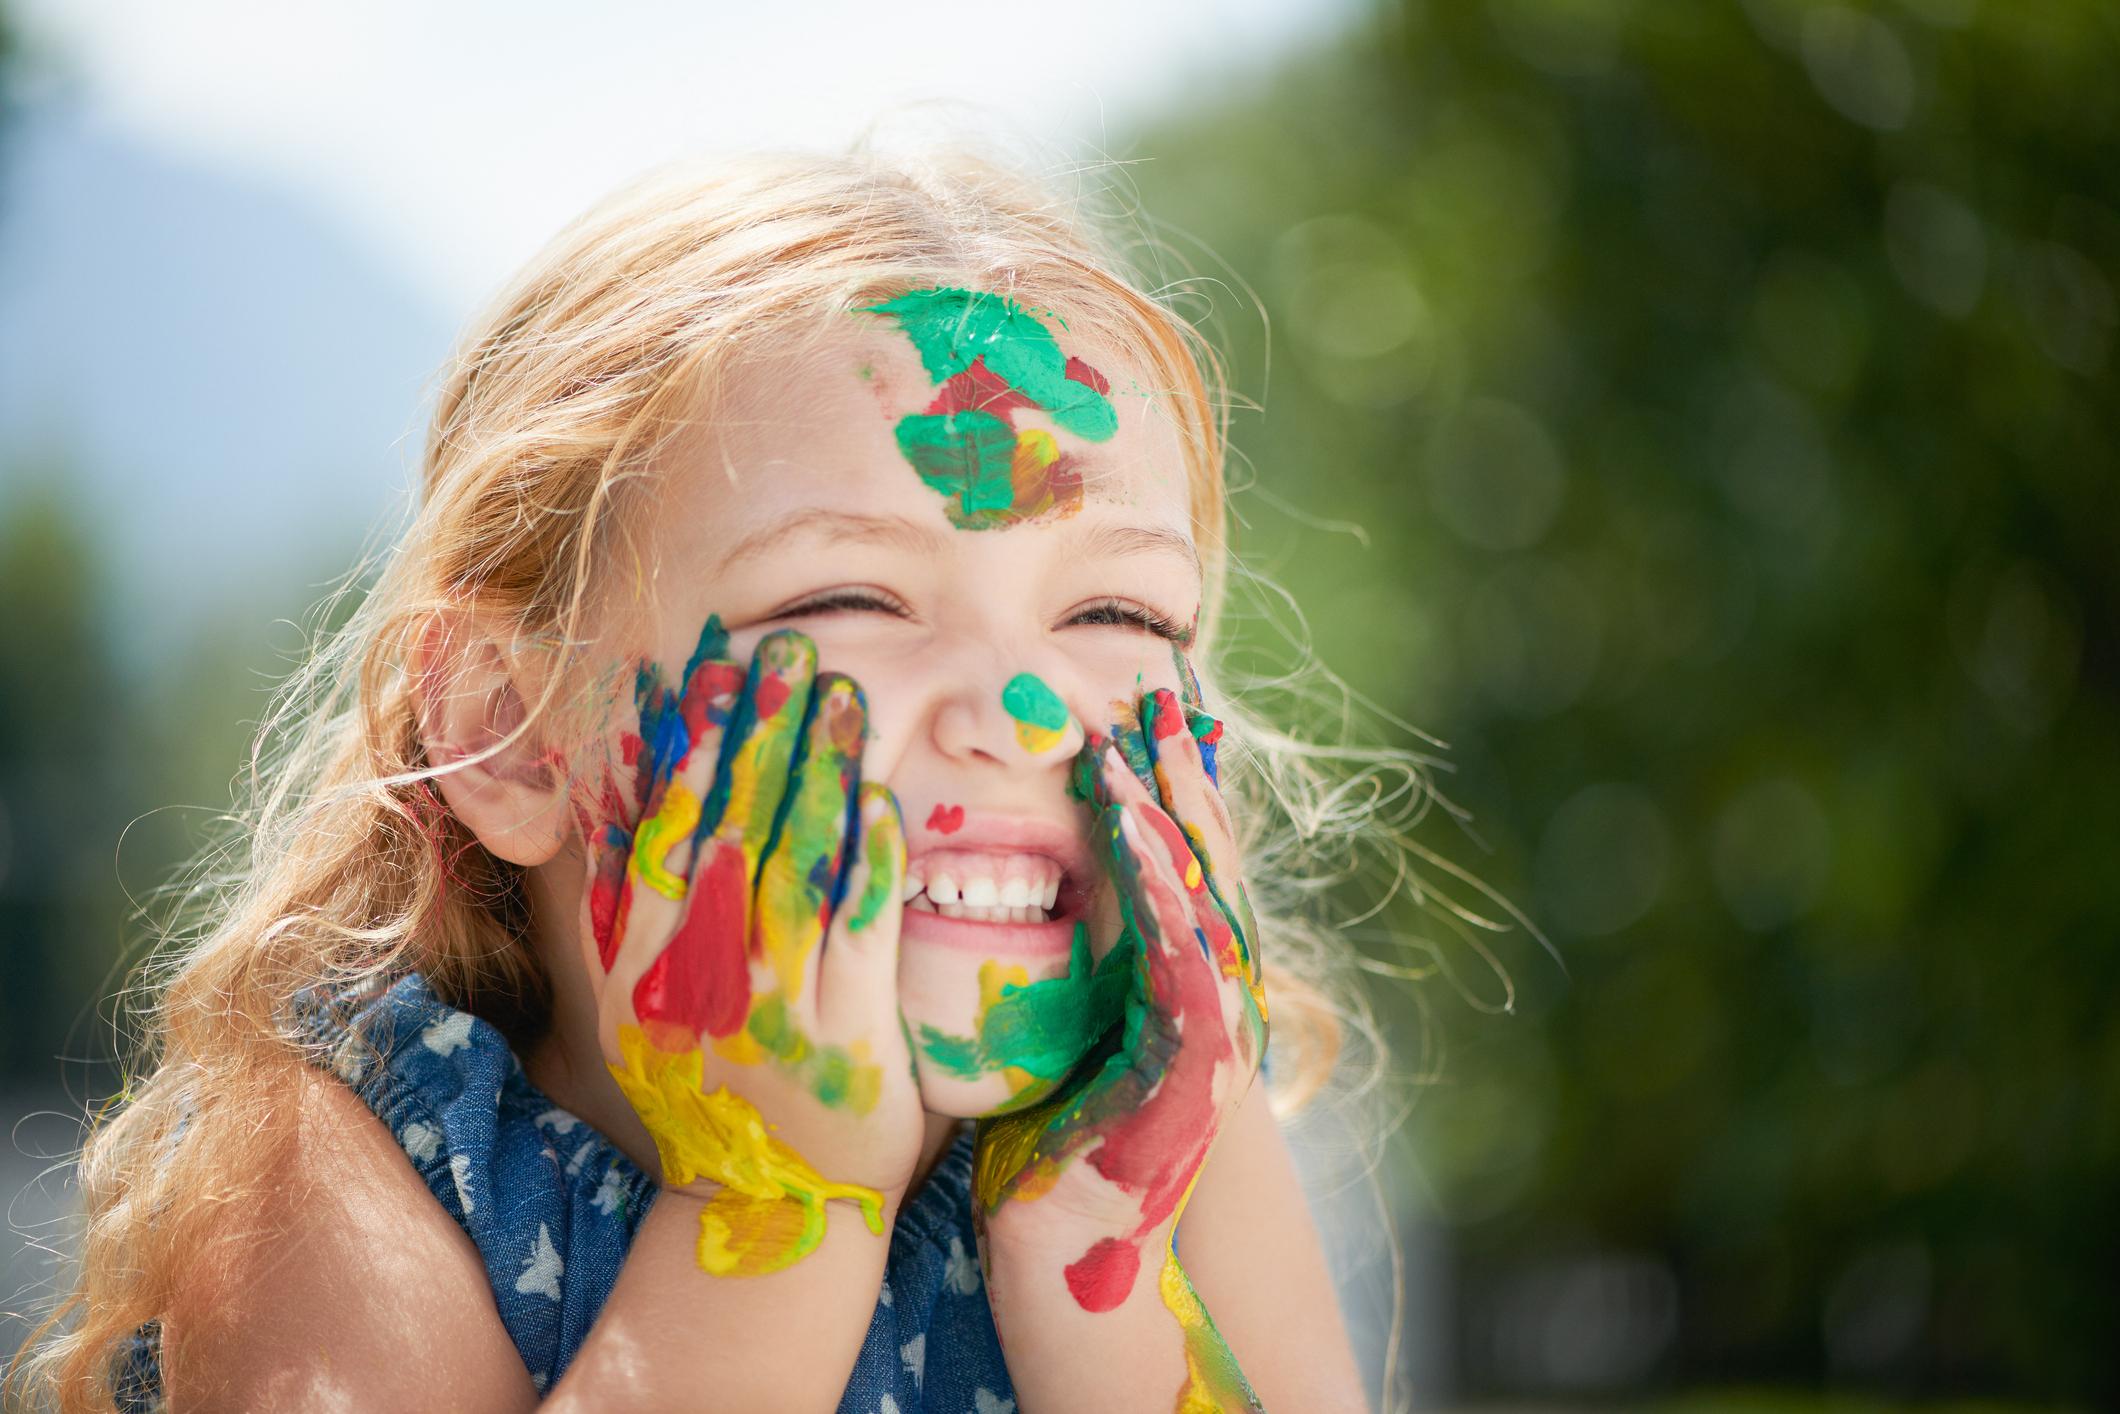 LagoMio - Kinderbetreuung am See - Pädagogik Vorkindergarten